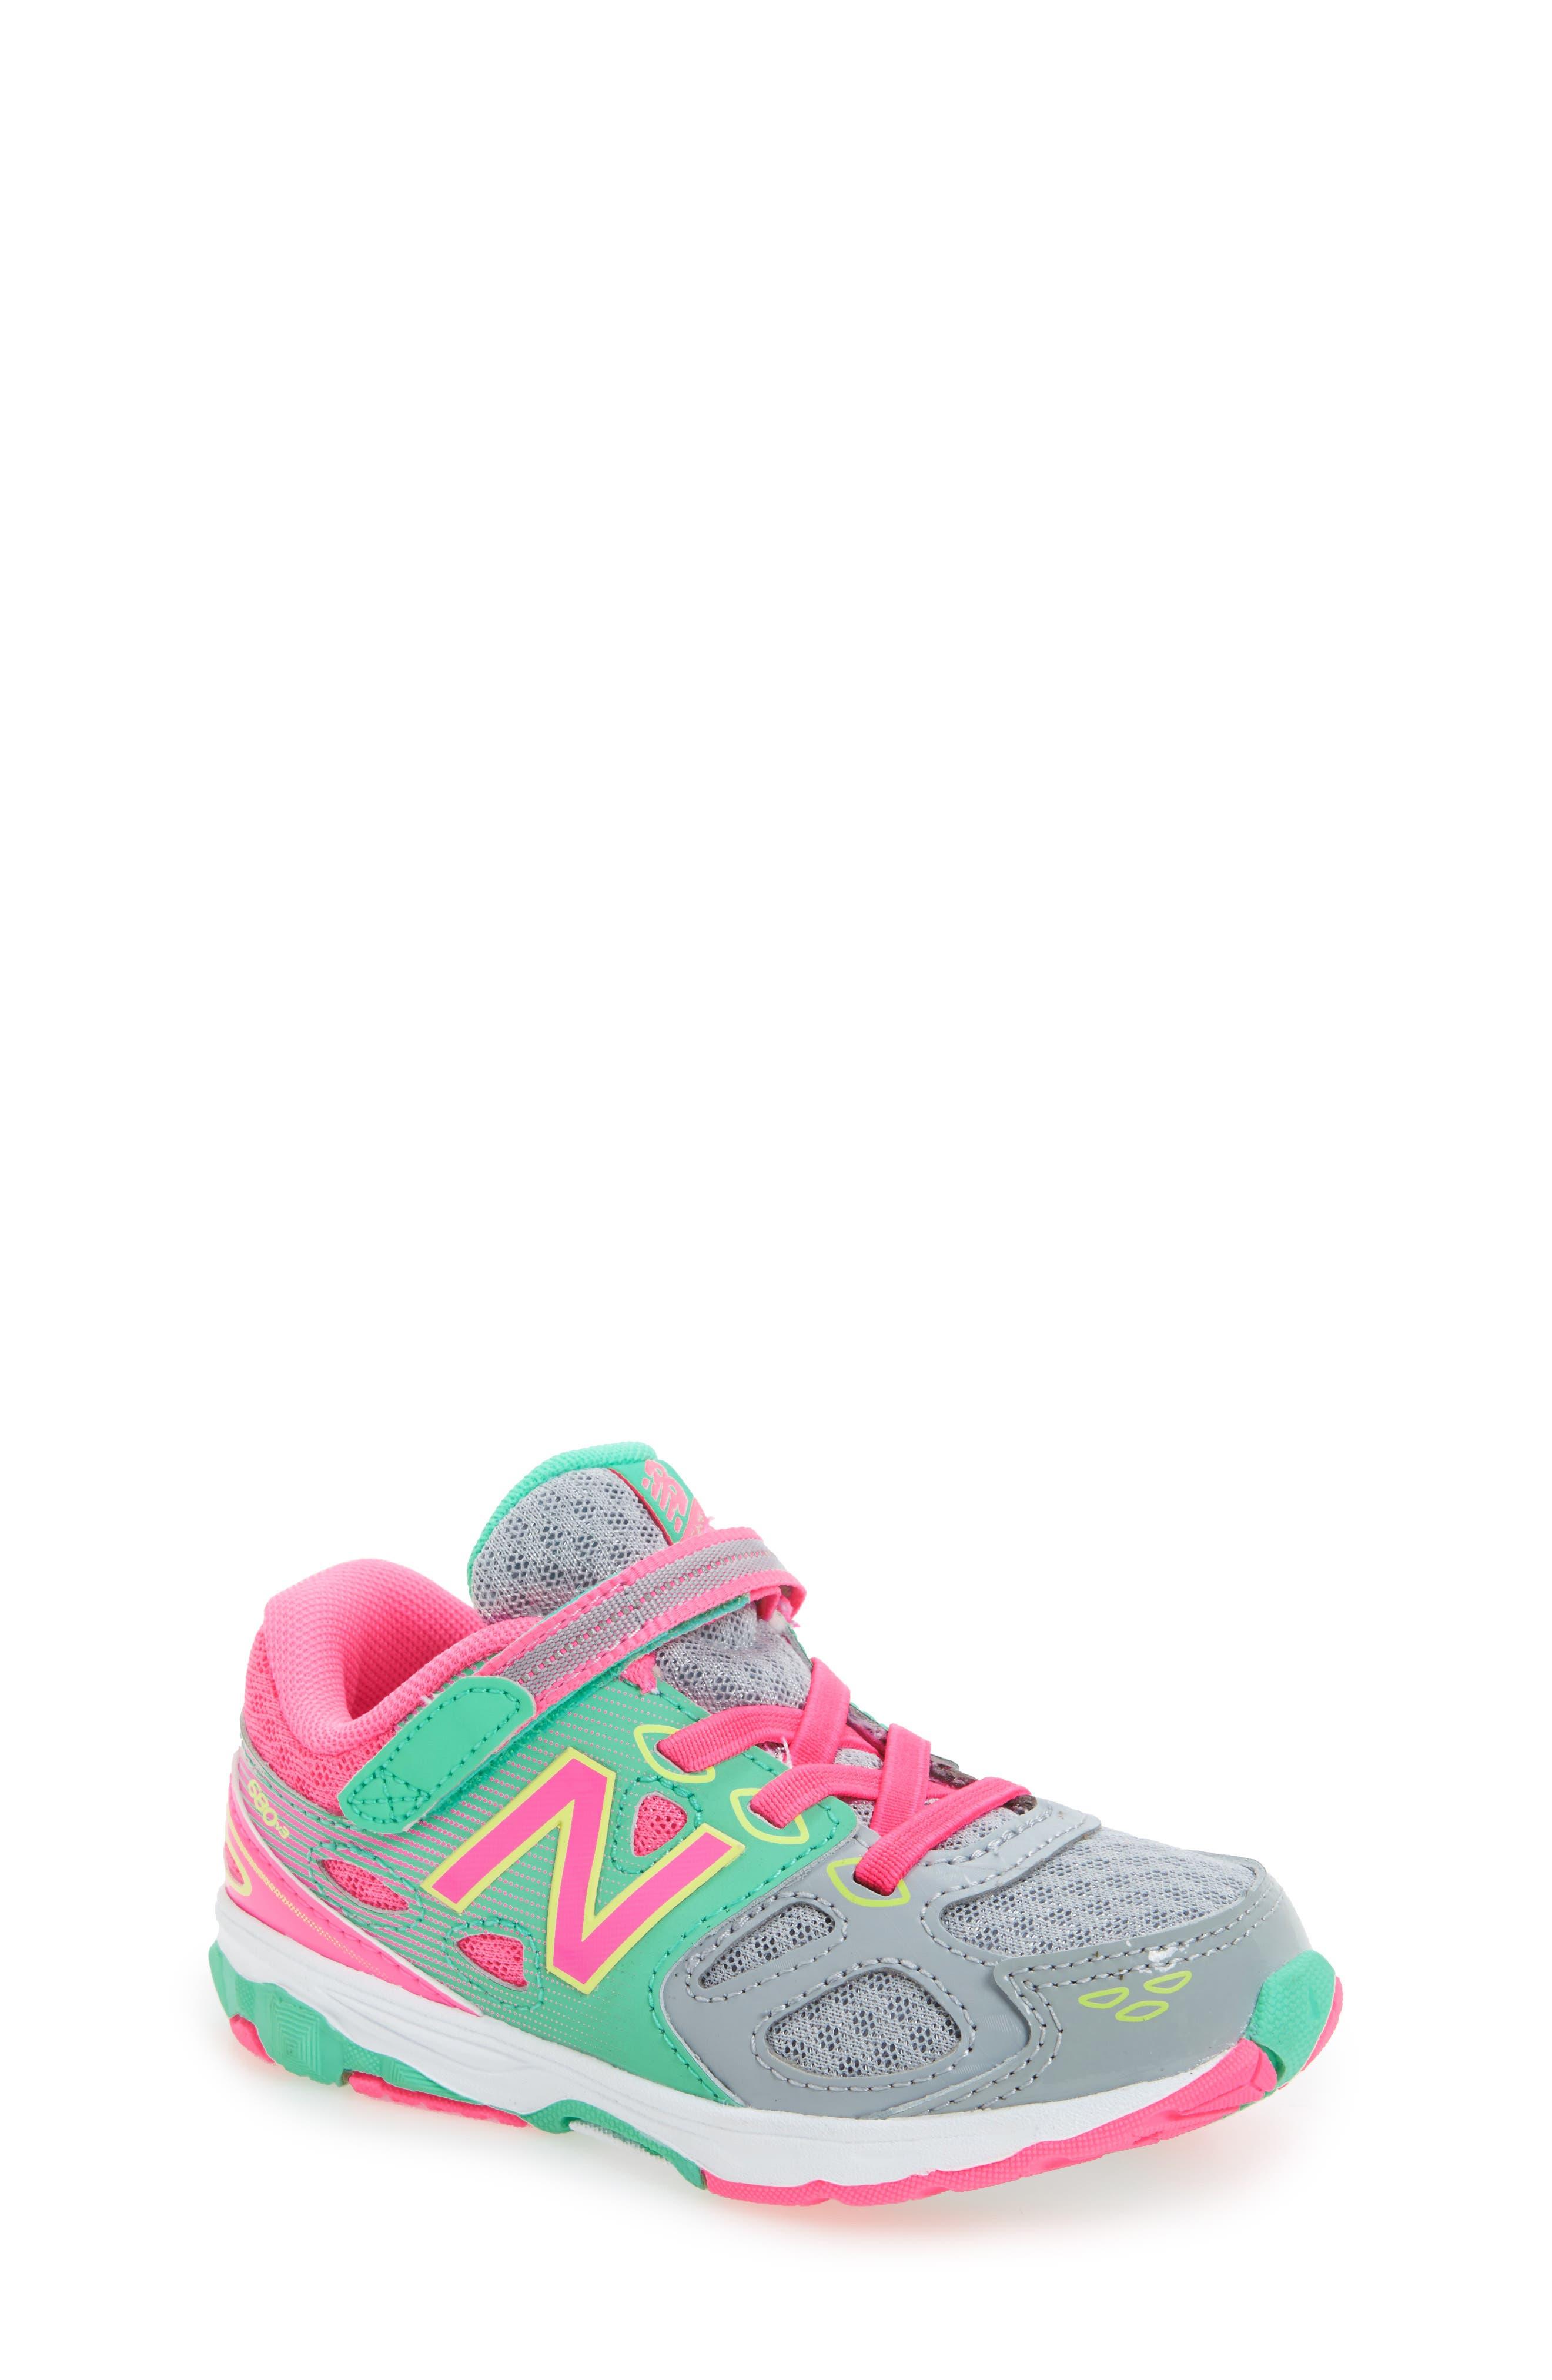 New Balance 680v3 Sneaker (Baby, Walker, Toddler, Little Kid & Big Kid)